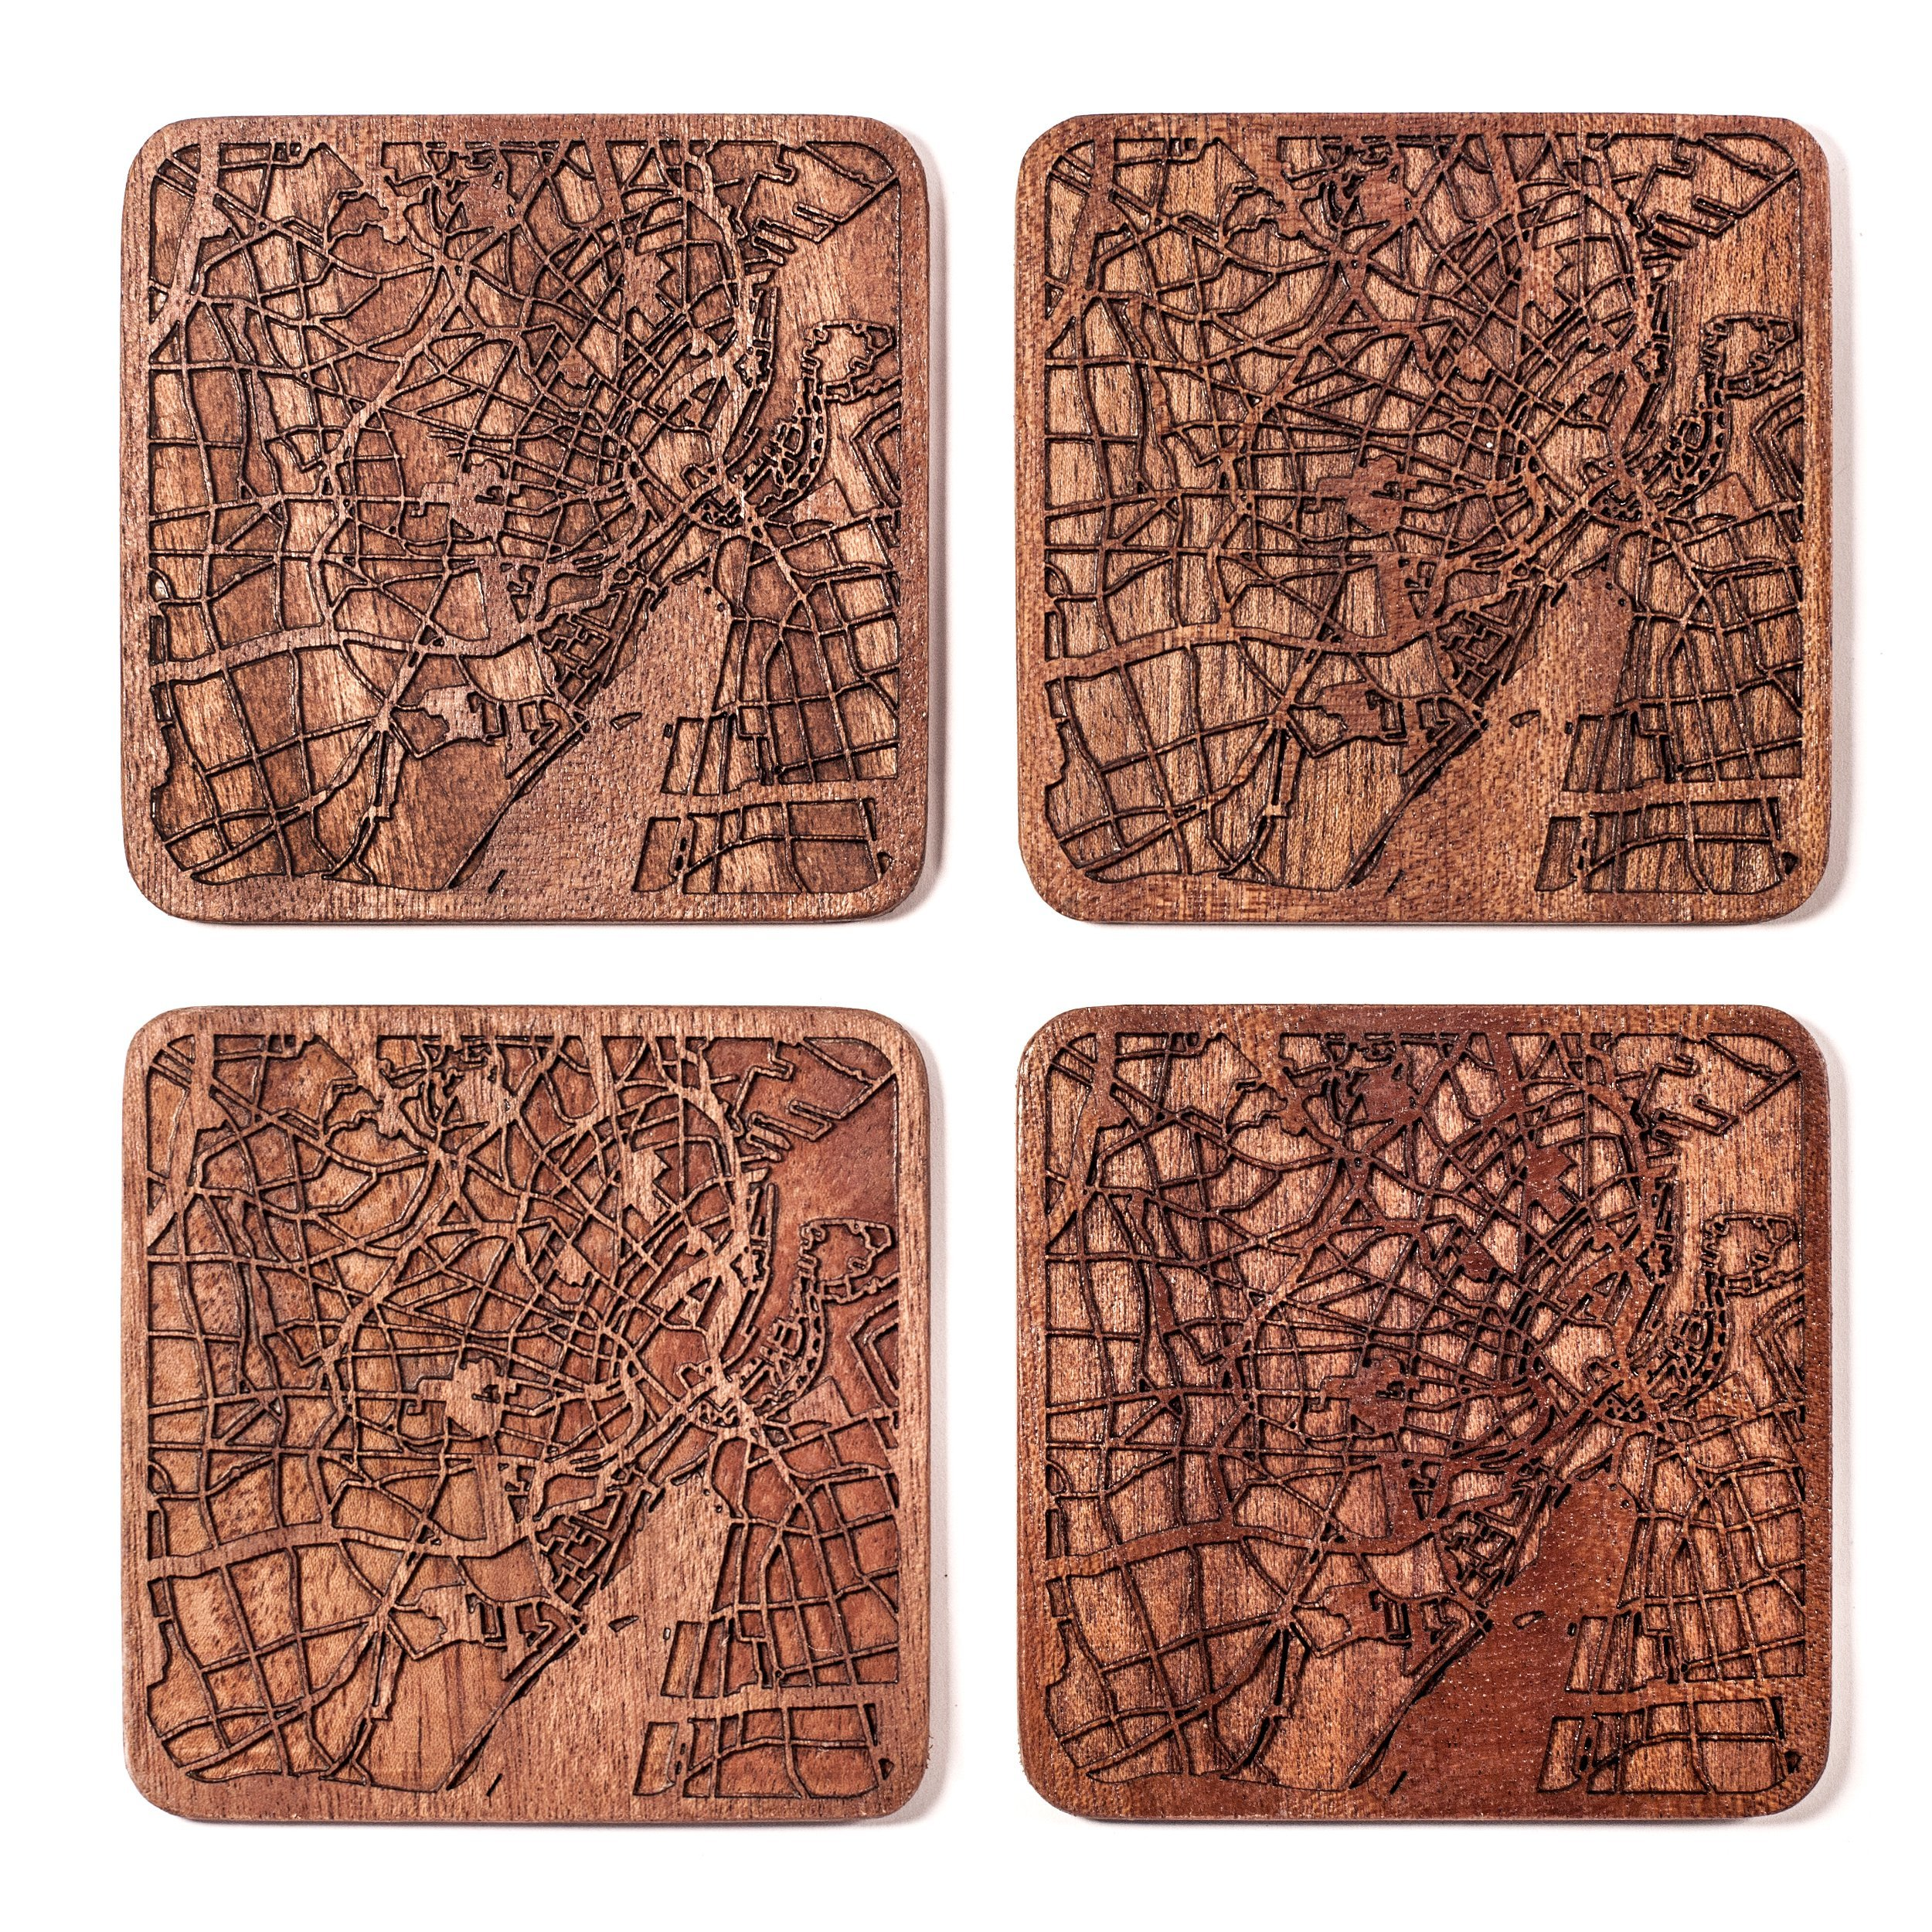 Copenhagen Map Coaster by O3 Design Studio, Set Of